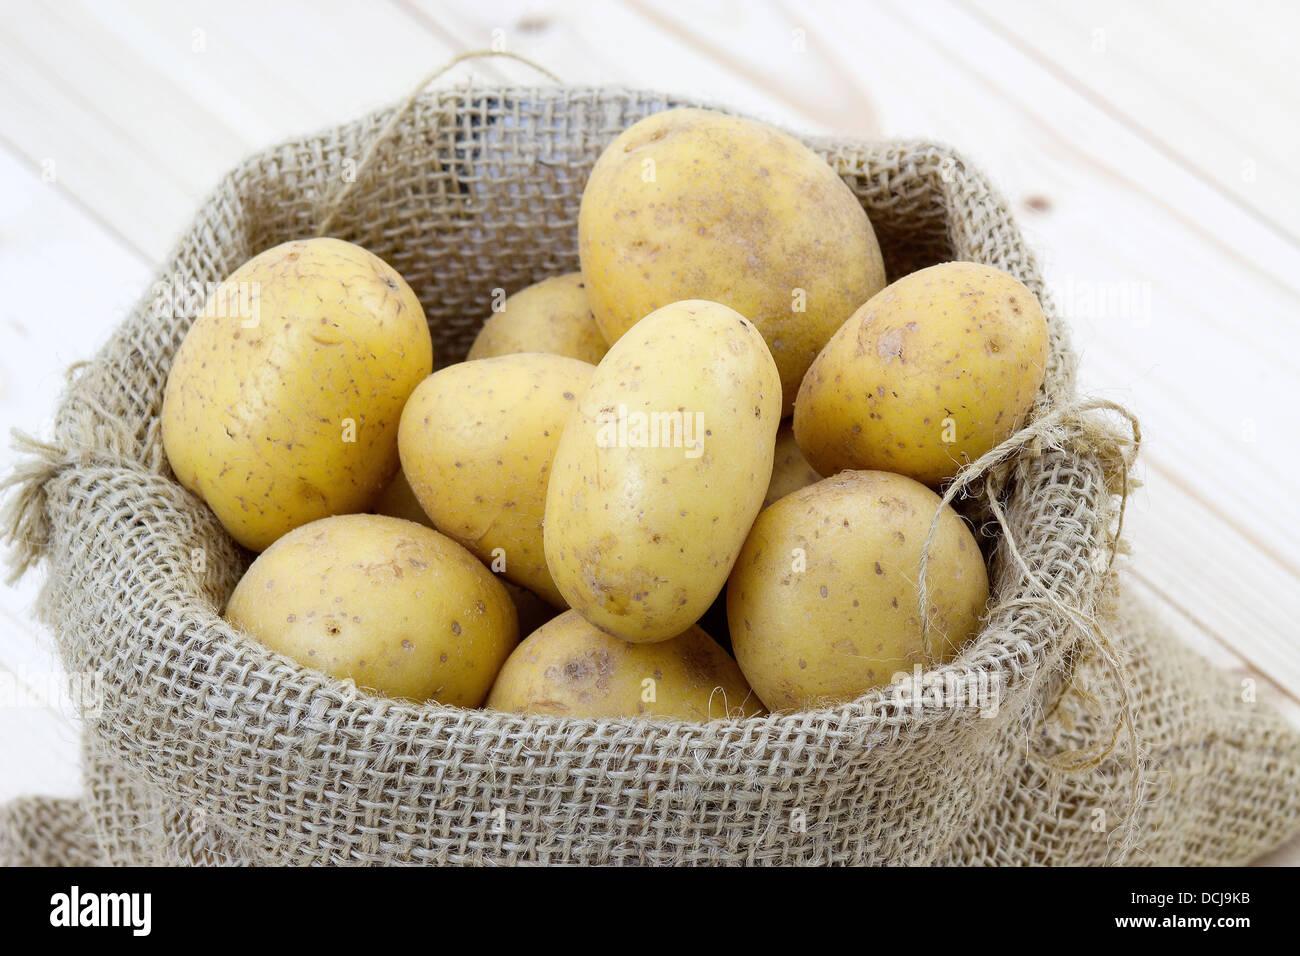 raw potatoes - Stock Image